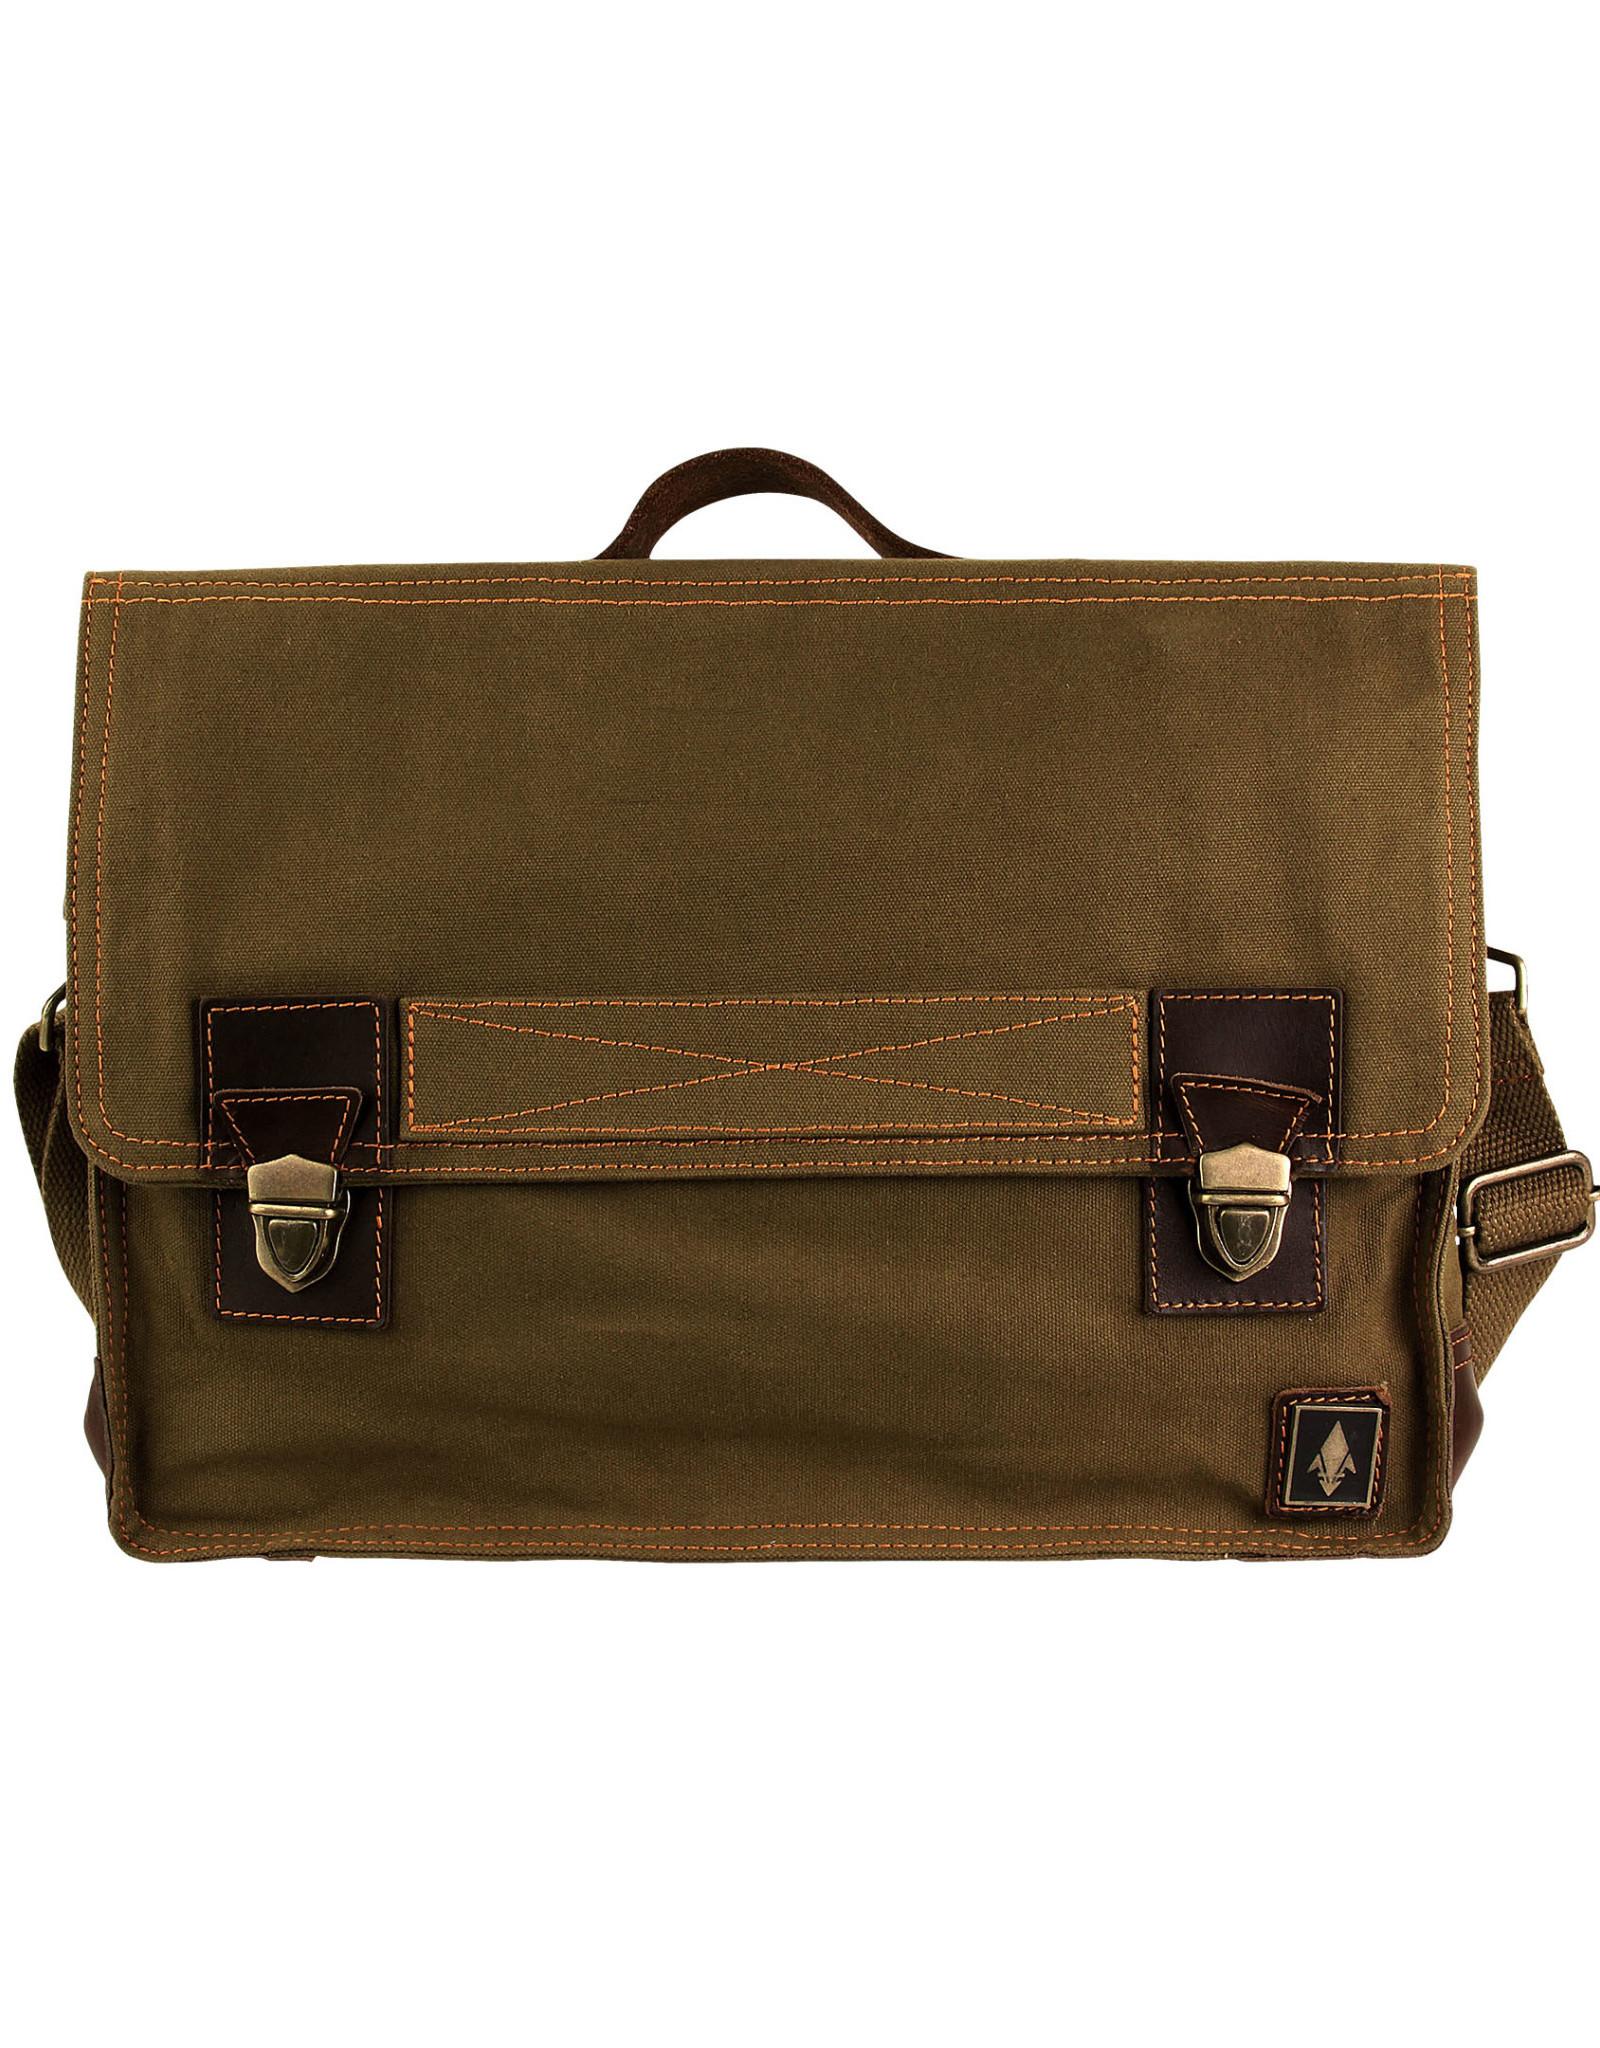 DAMNDOG Work Bag - Brown/Green